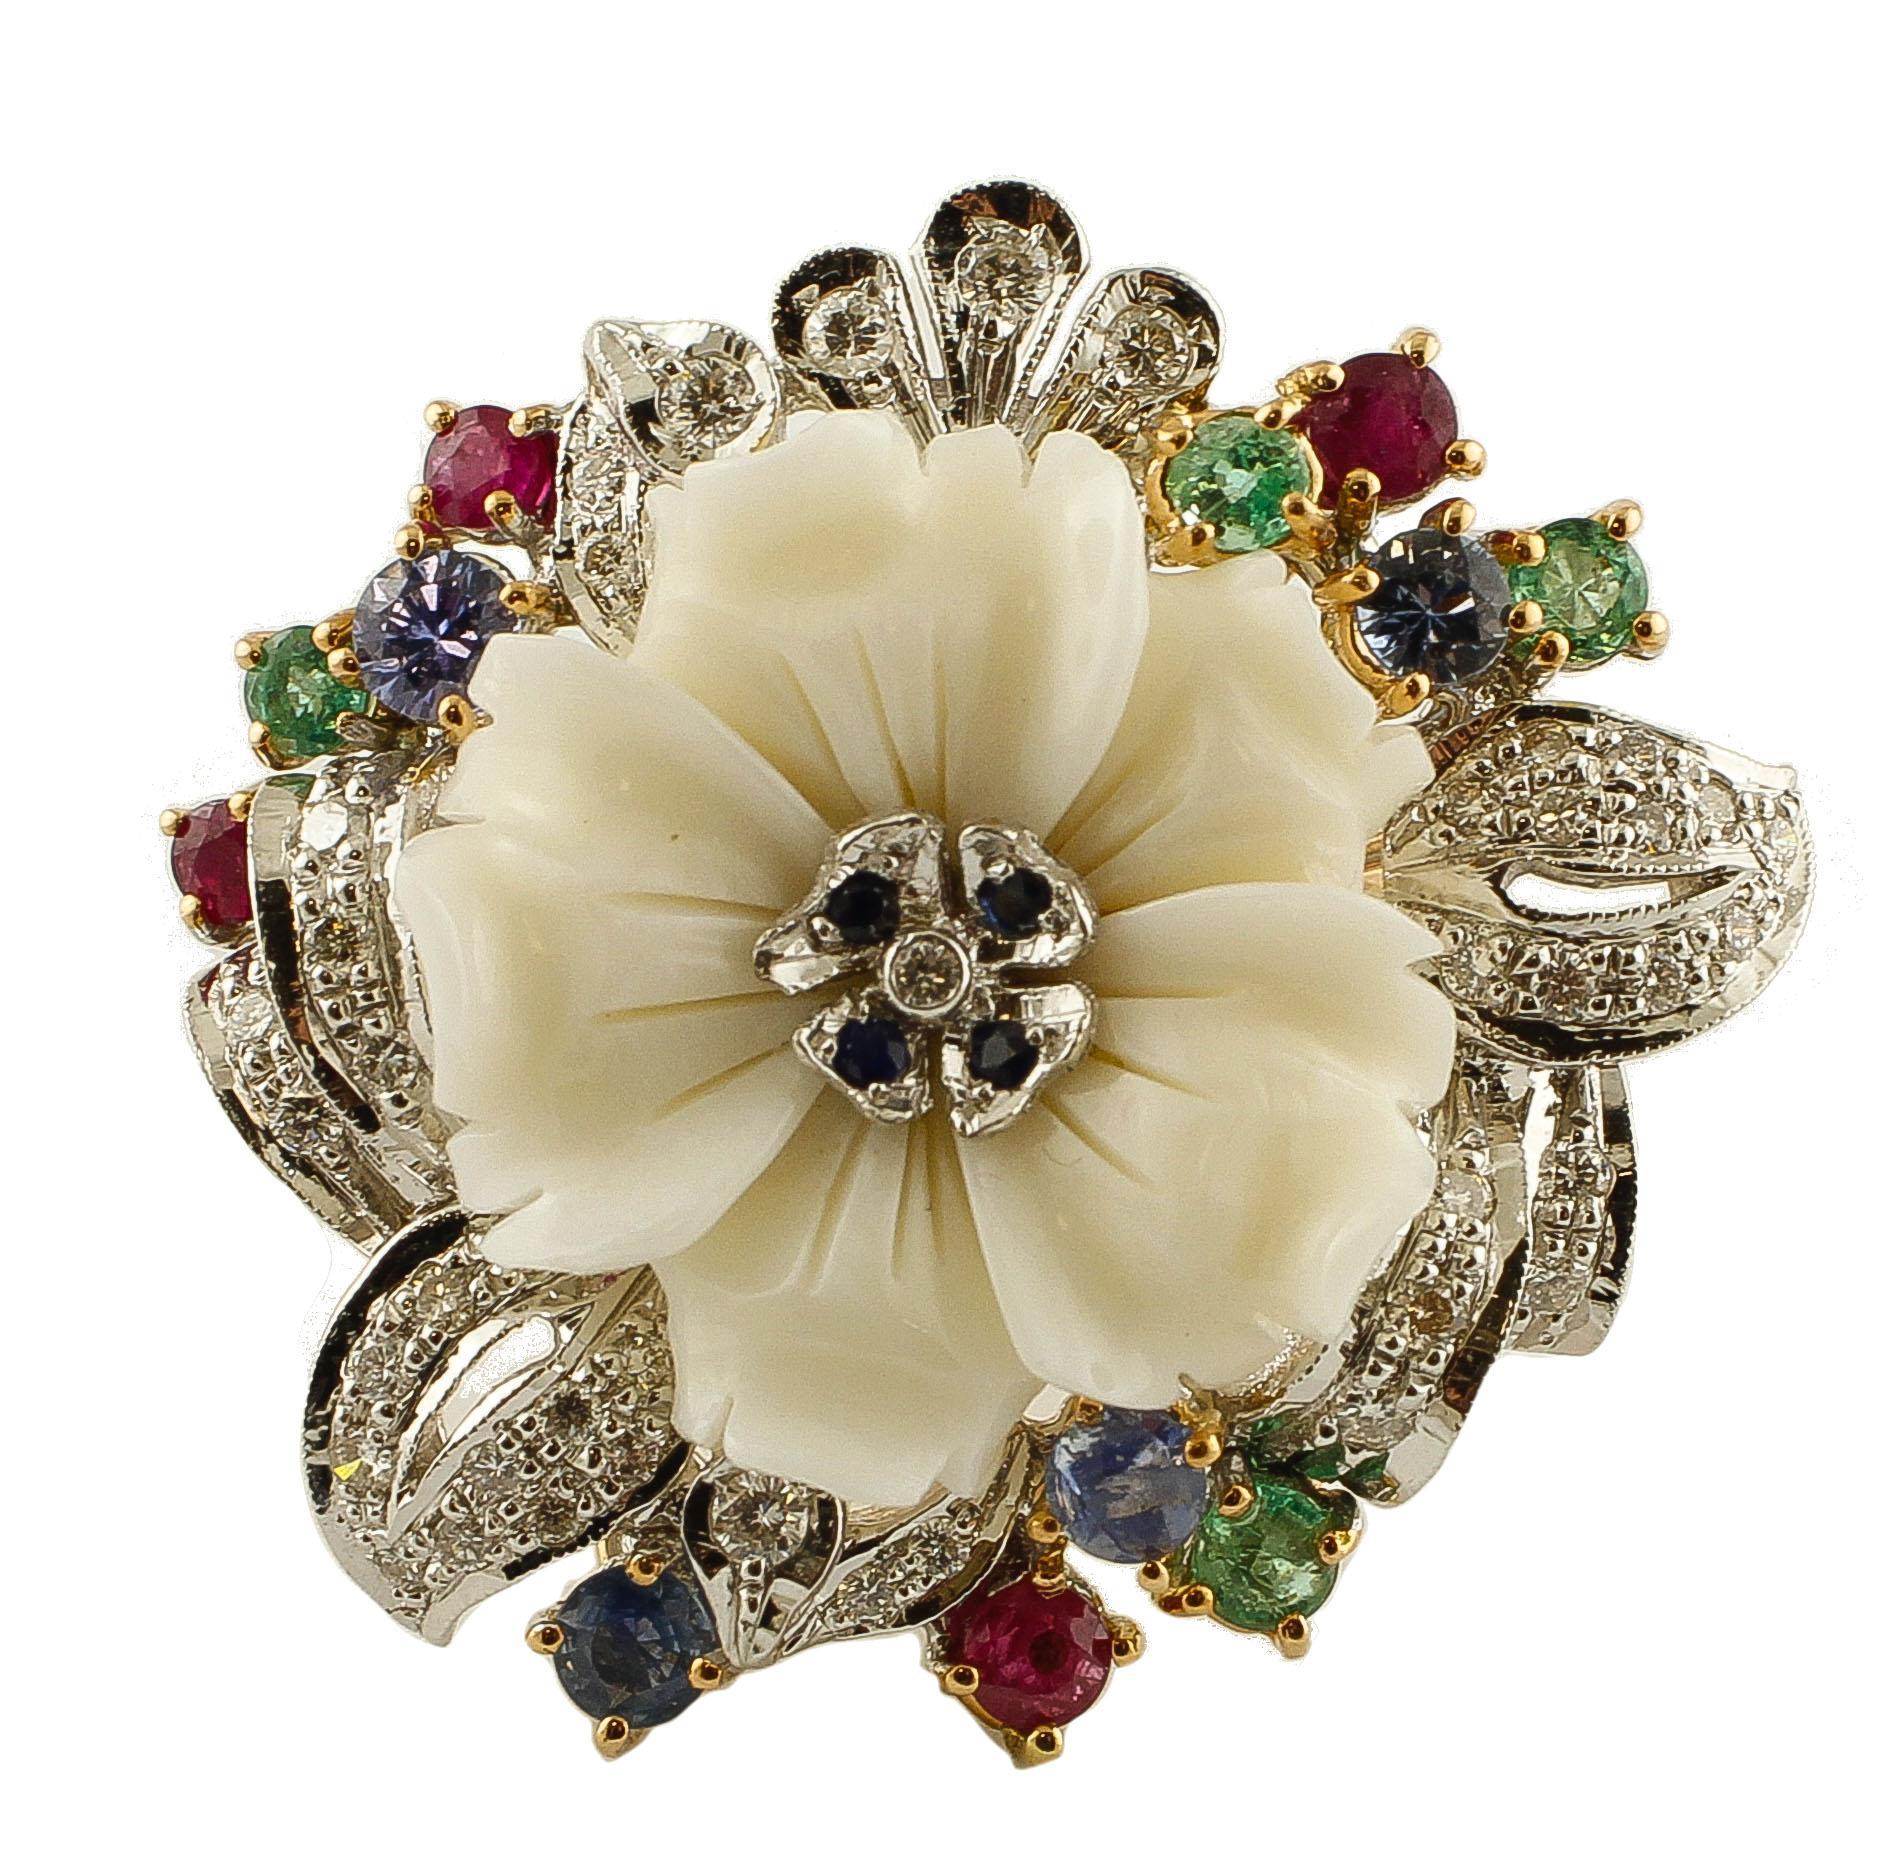 Diamonds,Rubies,Emeralds,Sapphires,White Coral 14 Karat Rose and White Gold Ring